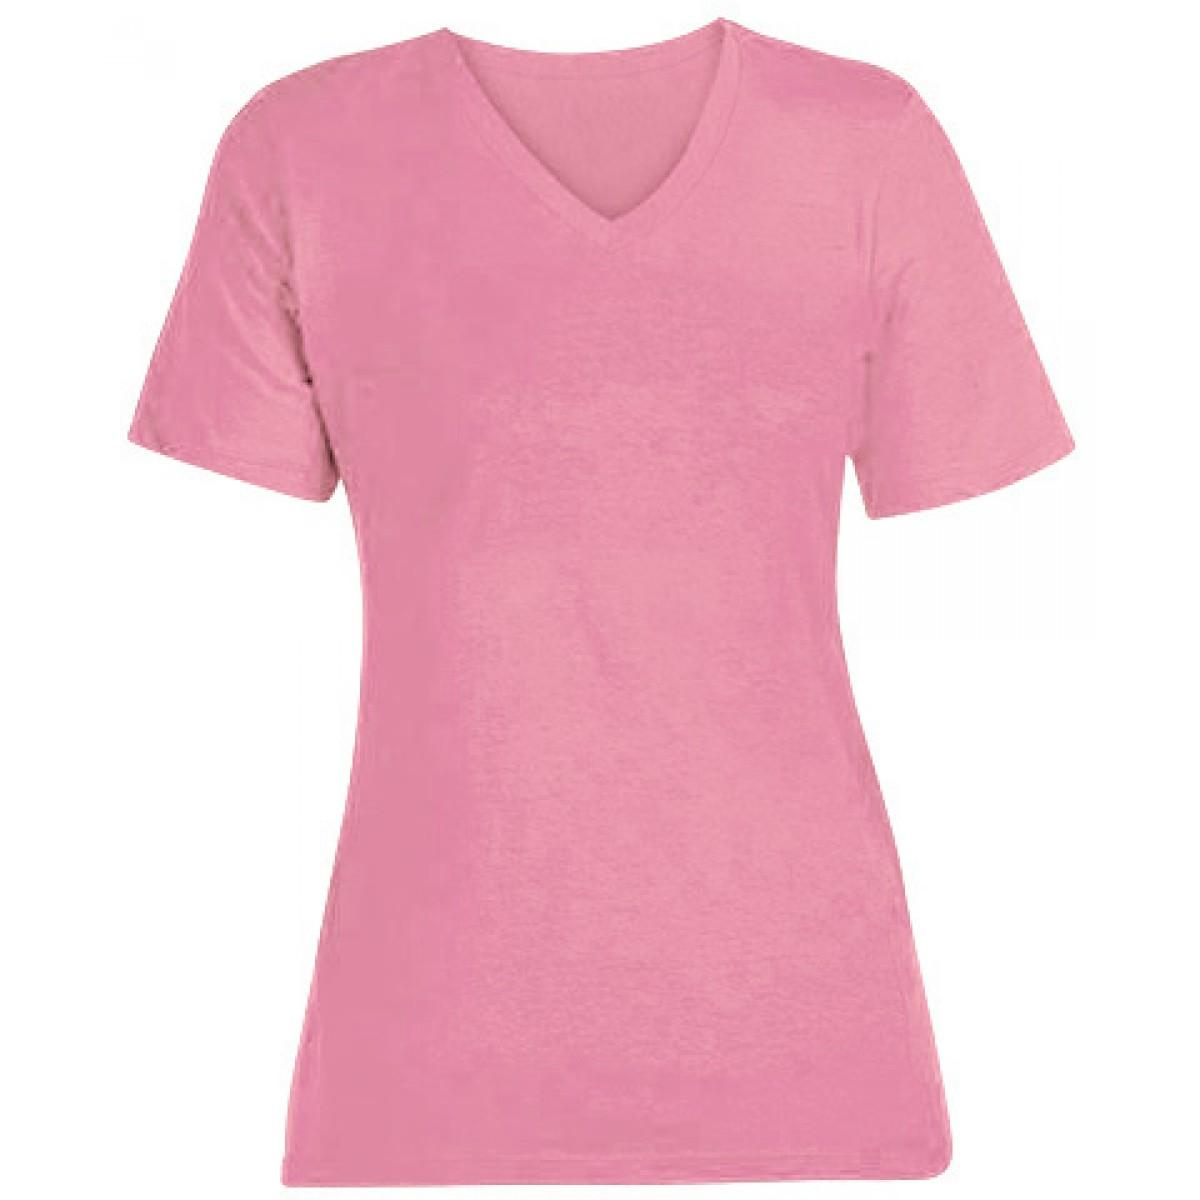 Econscious Ladies Short-Sleeve V-Neck